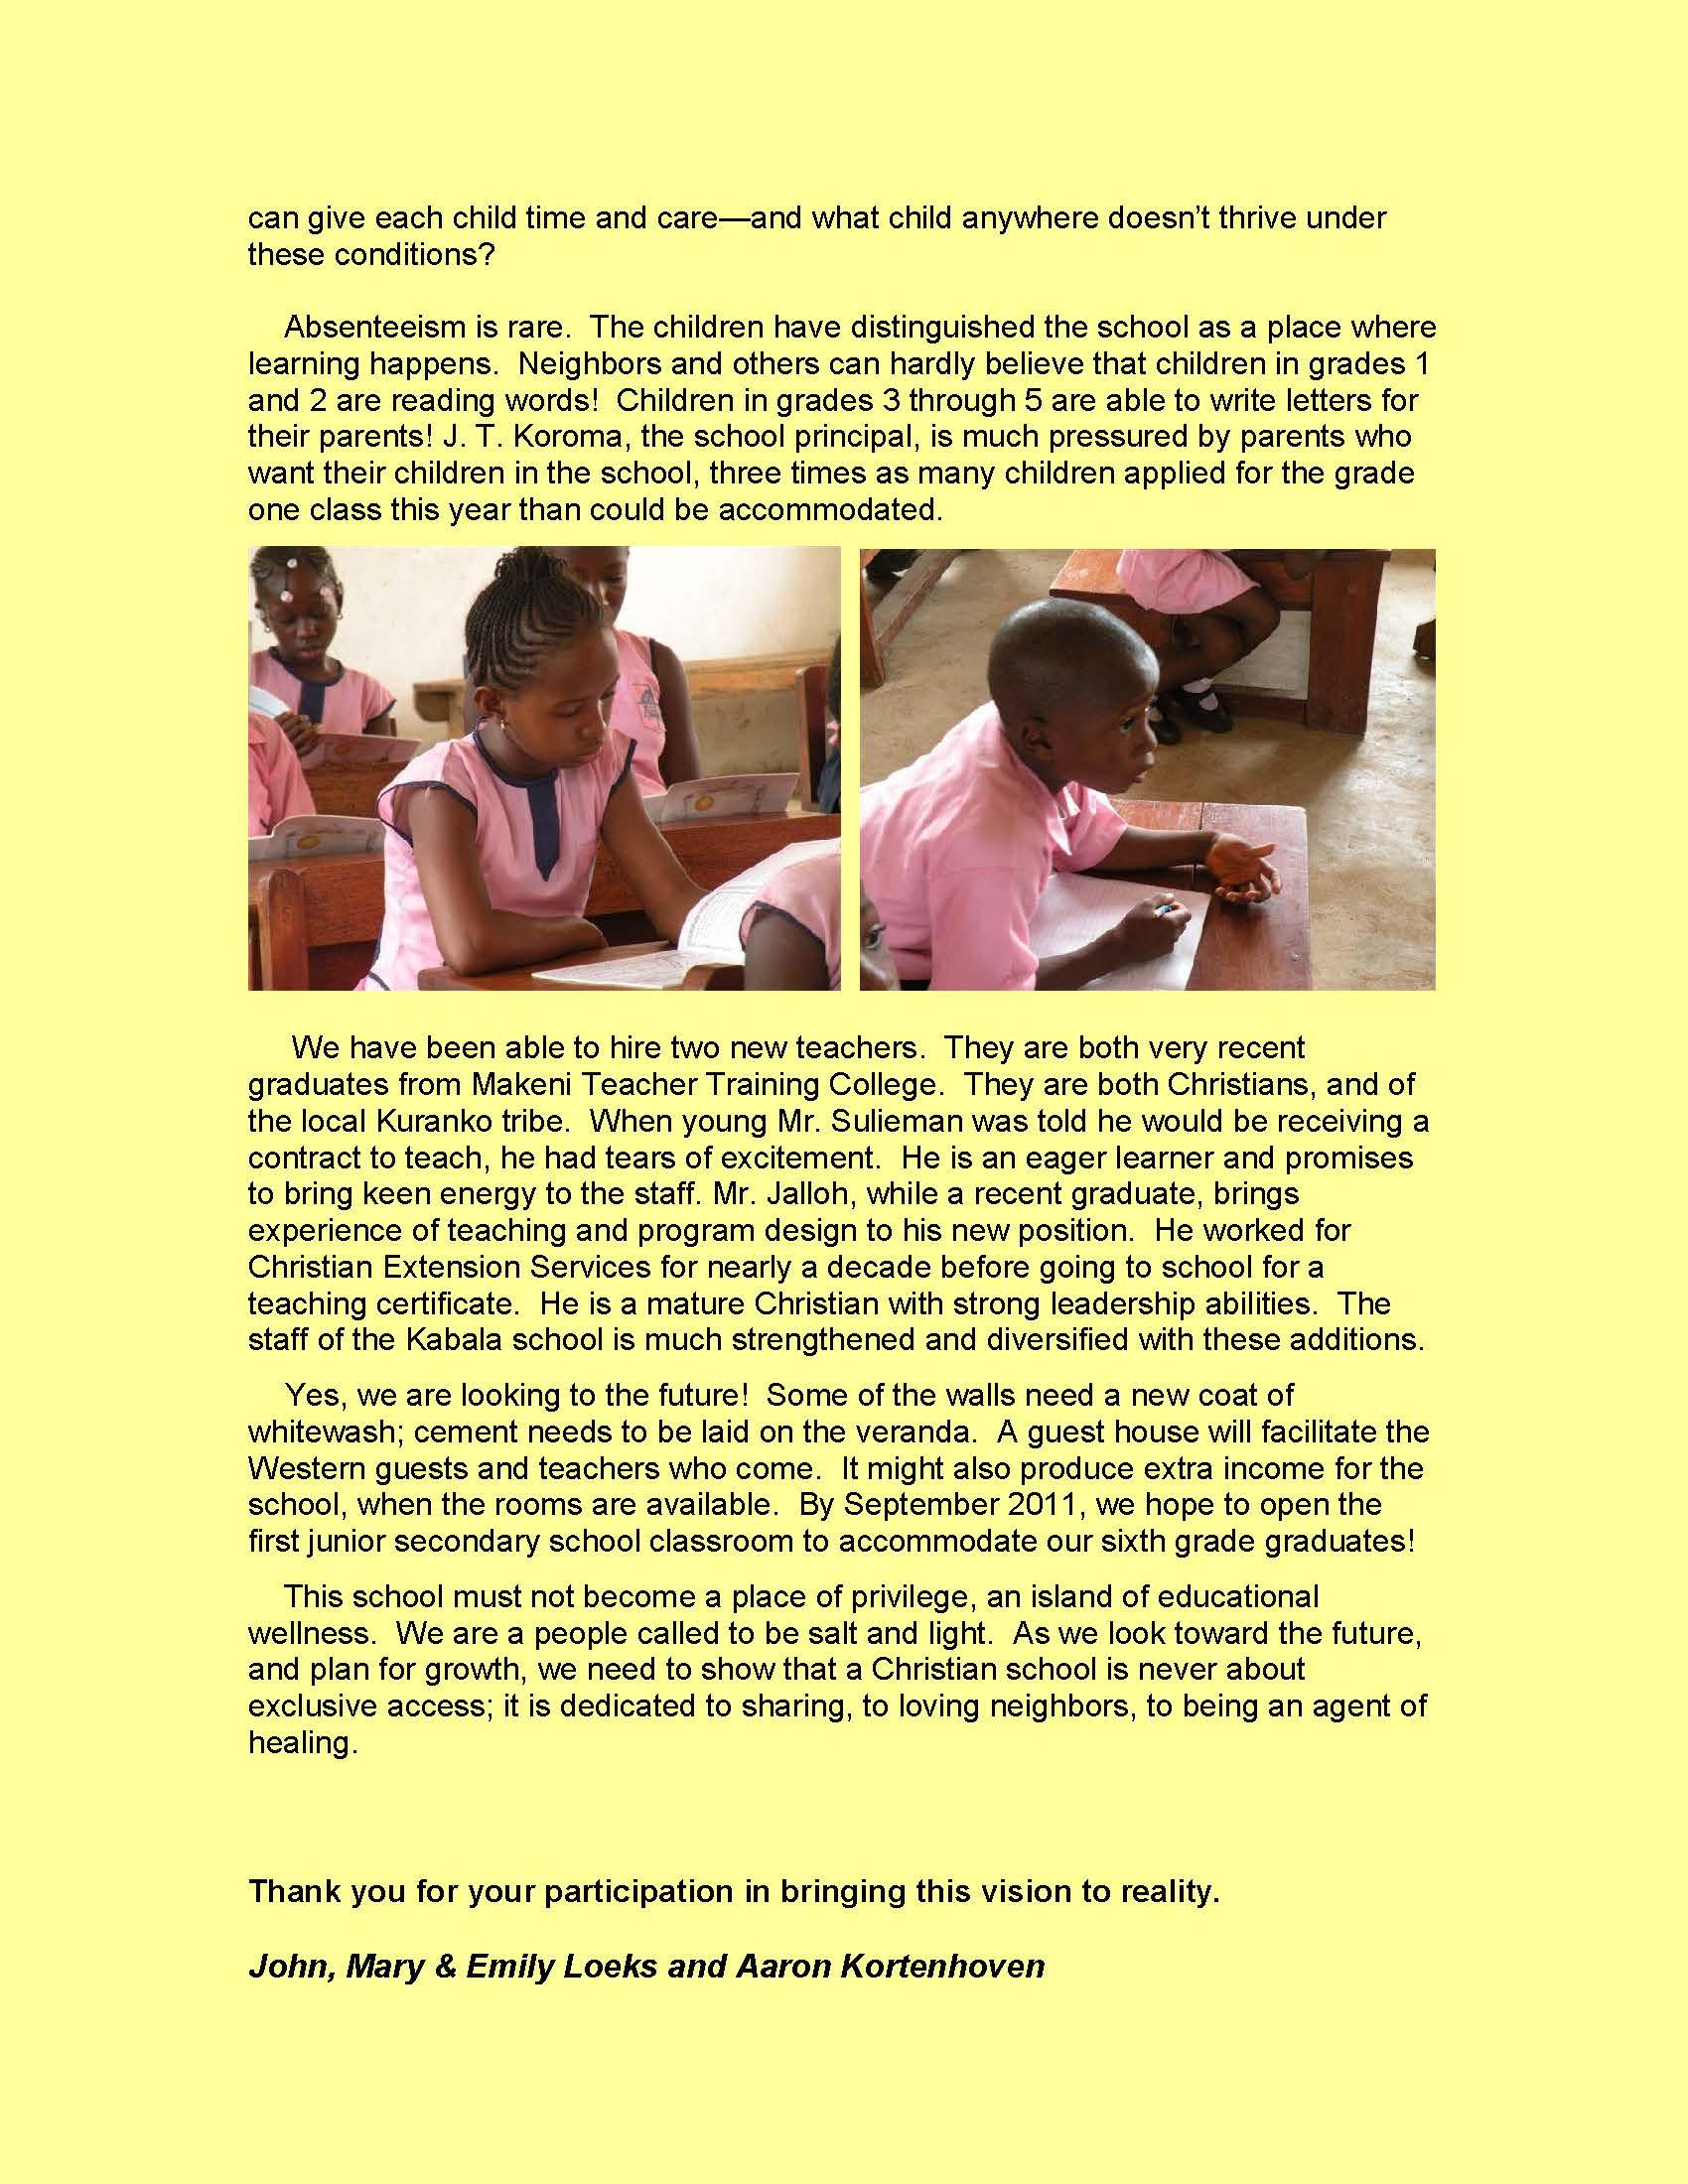 Kabala School Update  Oct  '09(3)_Page_2.jpg